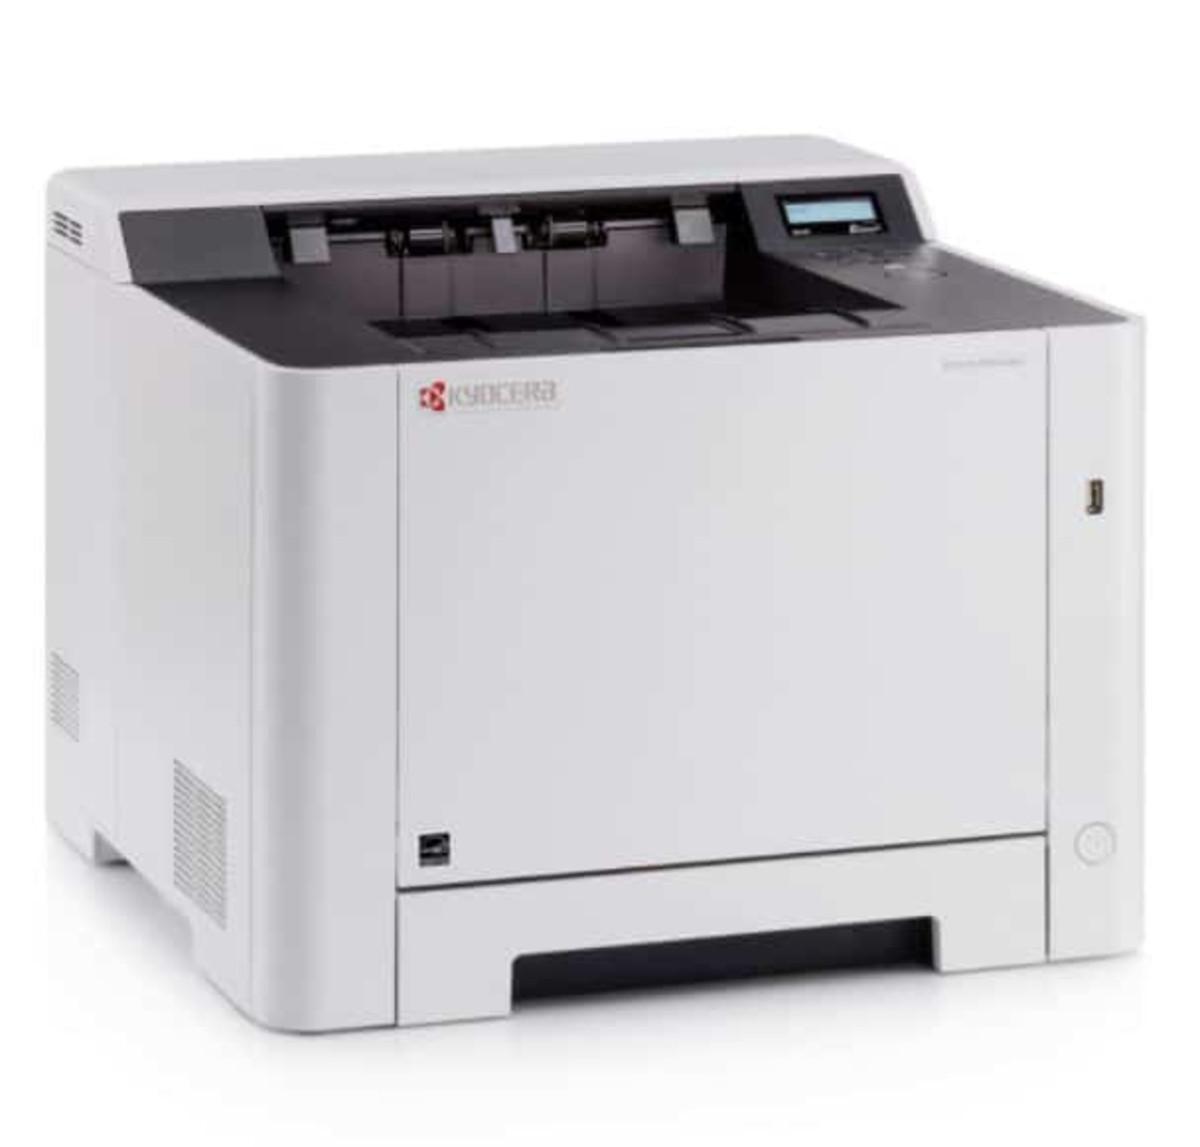 Kyocera ECOSYS P5021cdw Colour Laser Printer